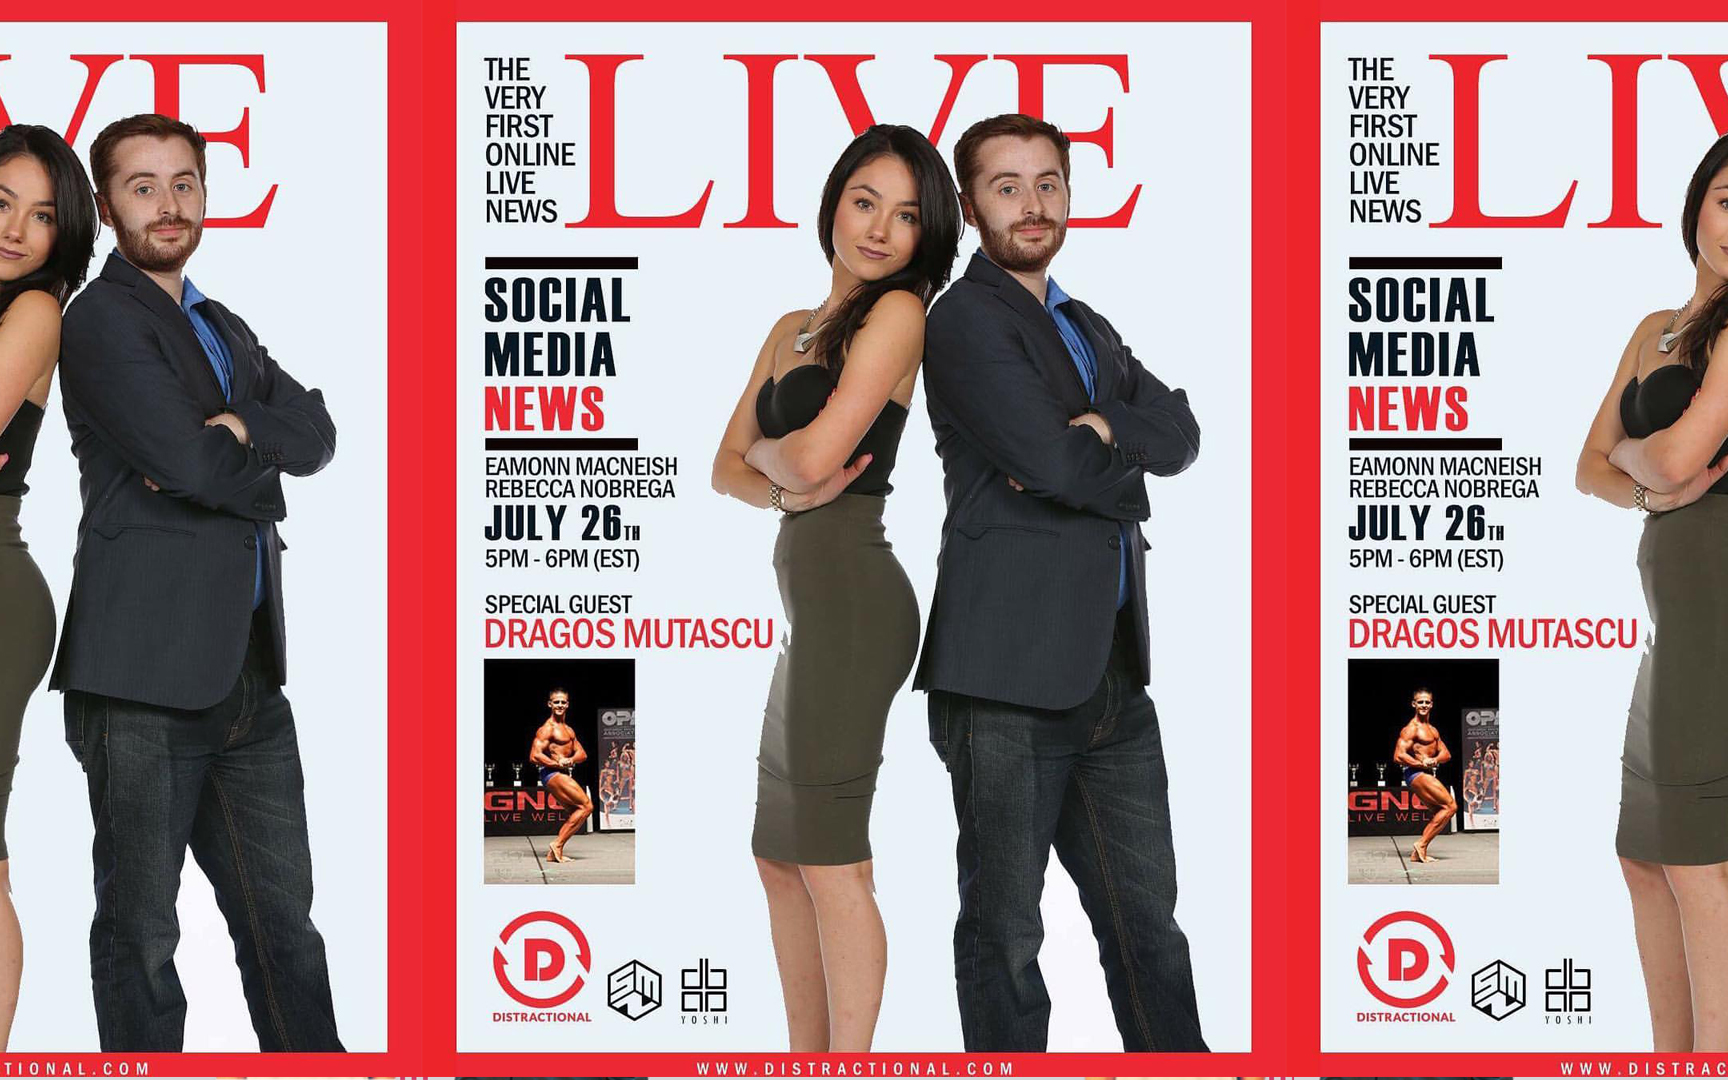 LIVE Social Media News Poster